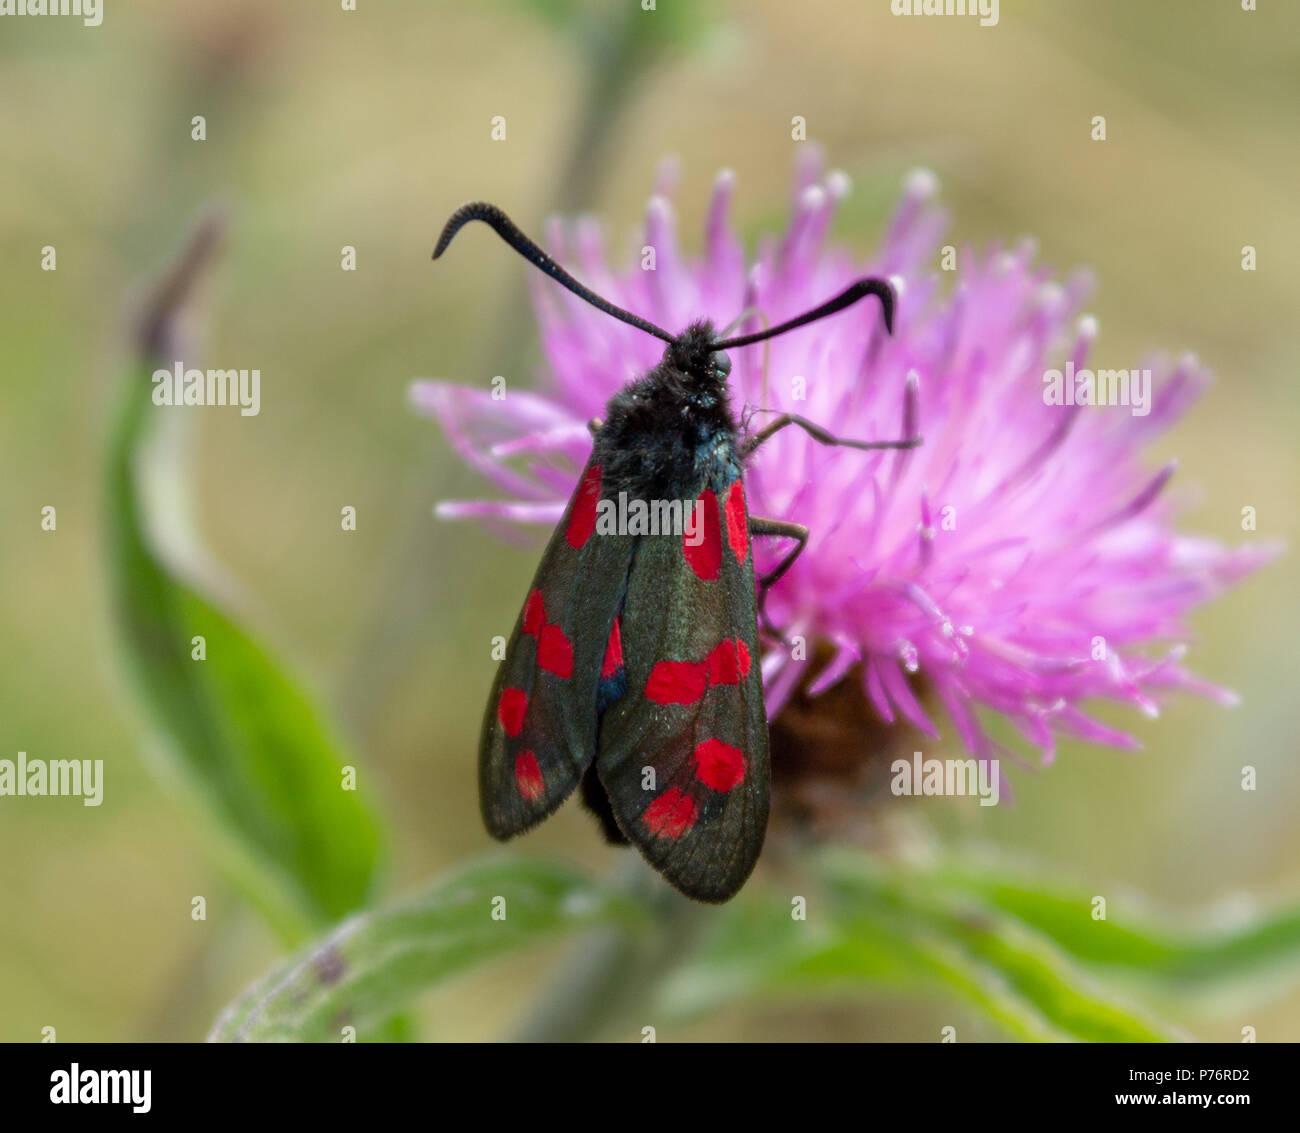 zygaena-filipendulae-6-spotted-burnet-moth-feeding-on-a-clover-flower-P76RD2.jpg